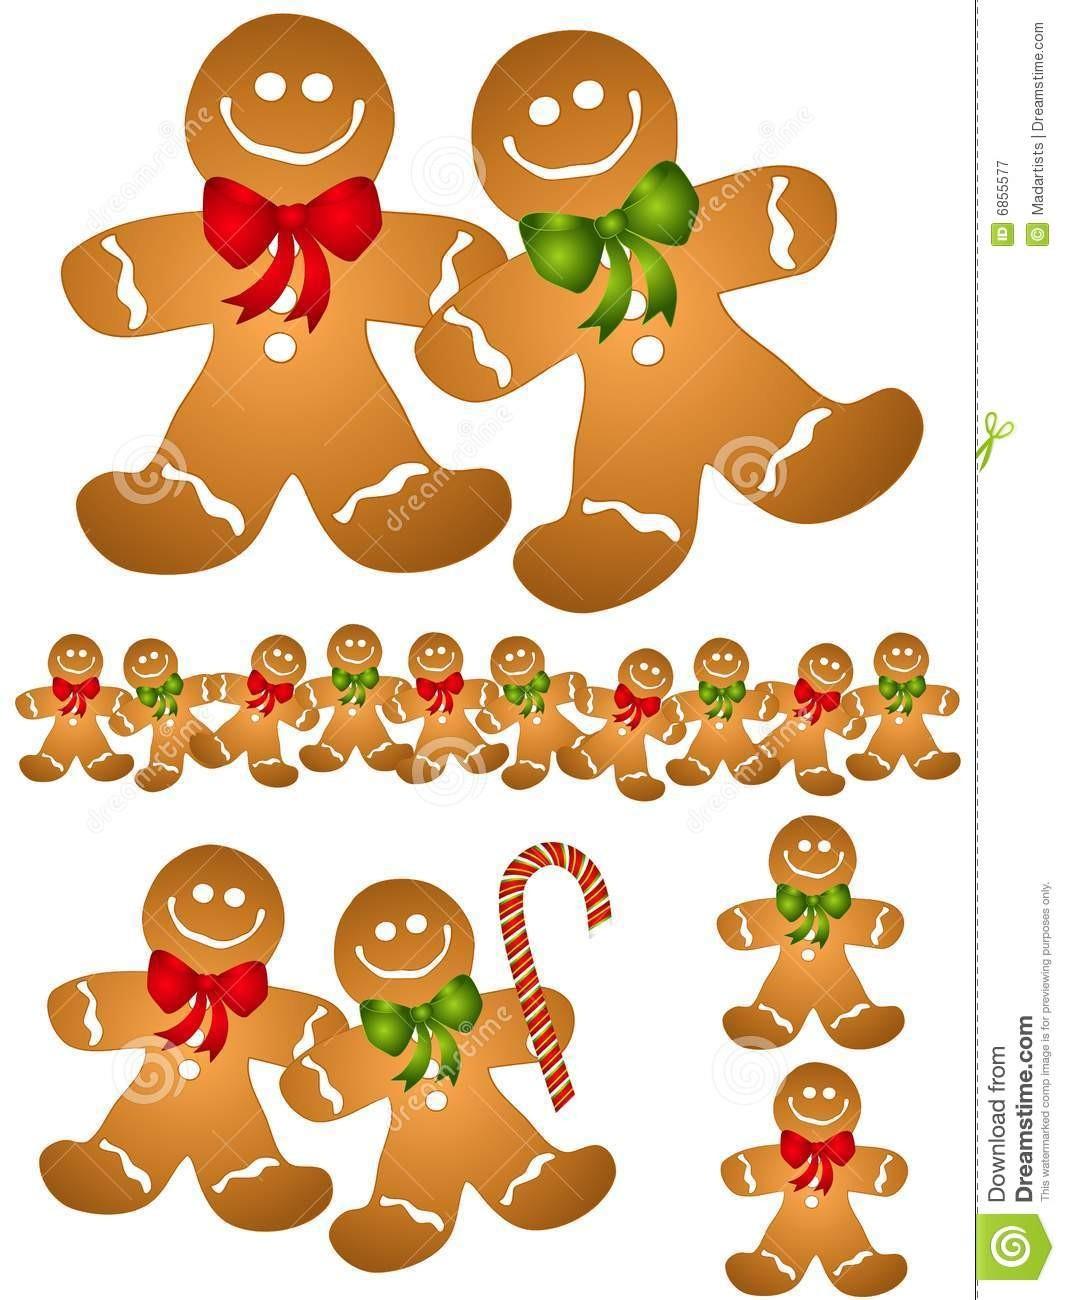 Gingerbread border clipart jpg black and white download Gingerbread House Border Clipart | salaharness.org jpg black and white download